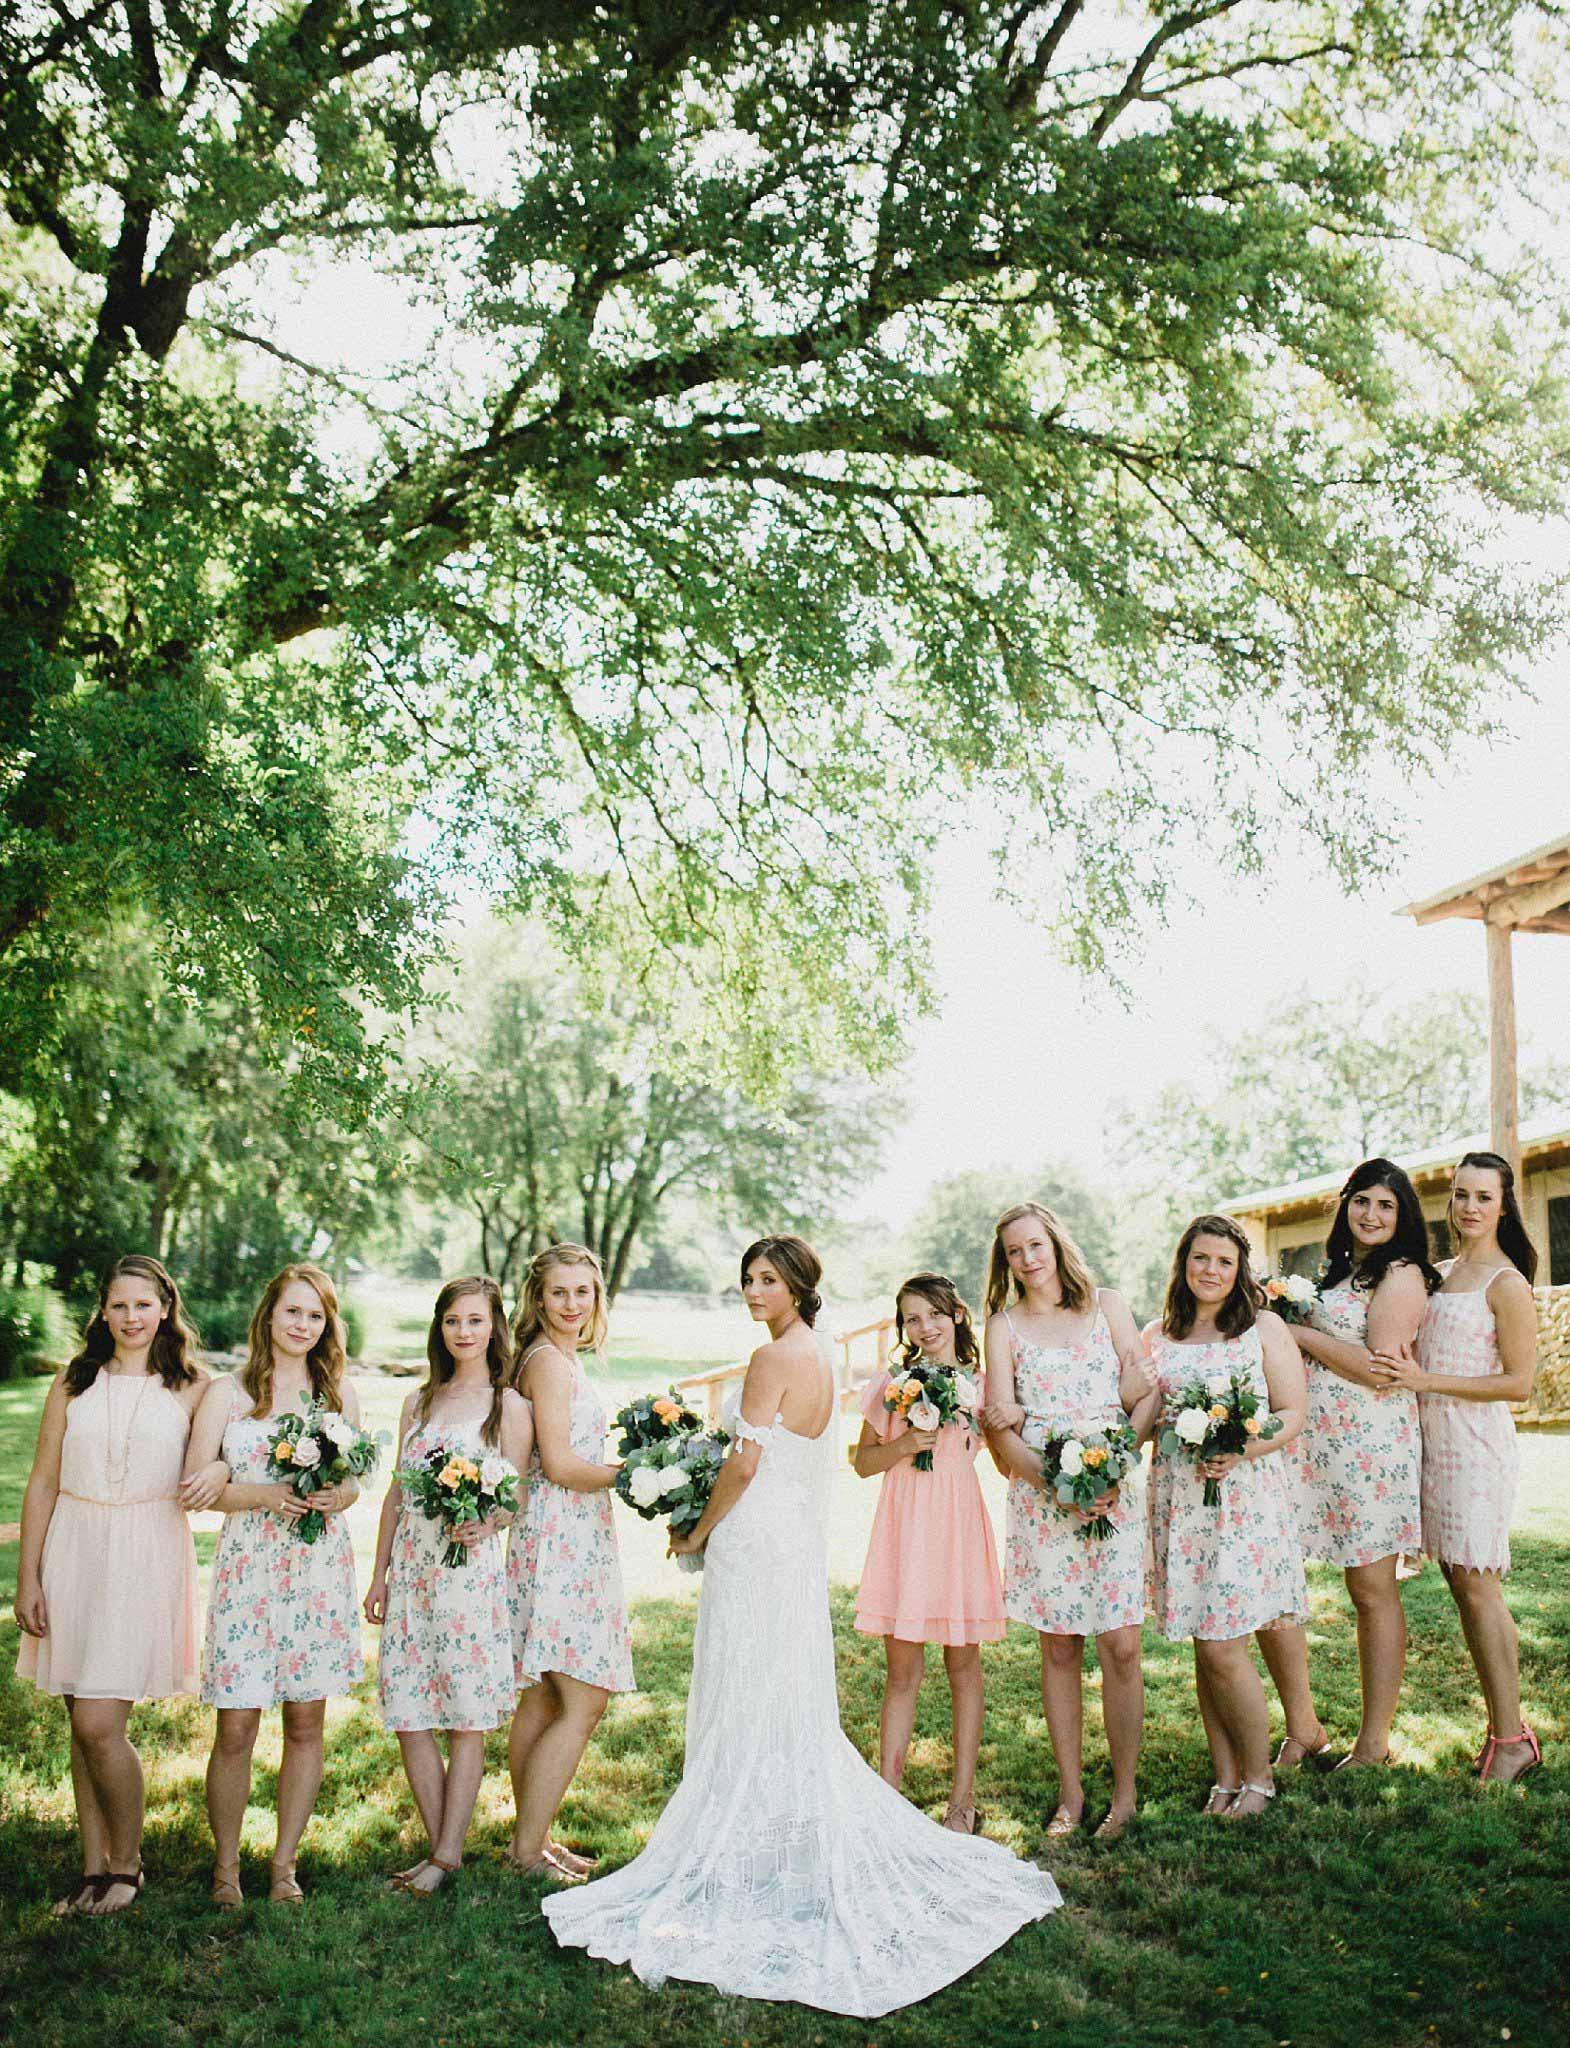 Bridesmaids where short floral print dress for a summer rustic wedding